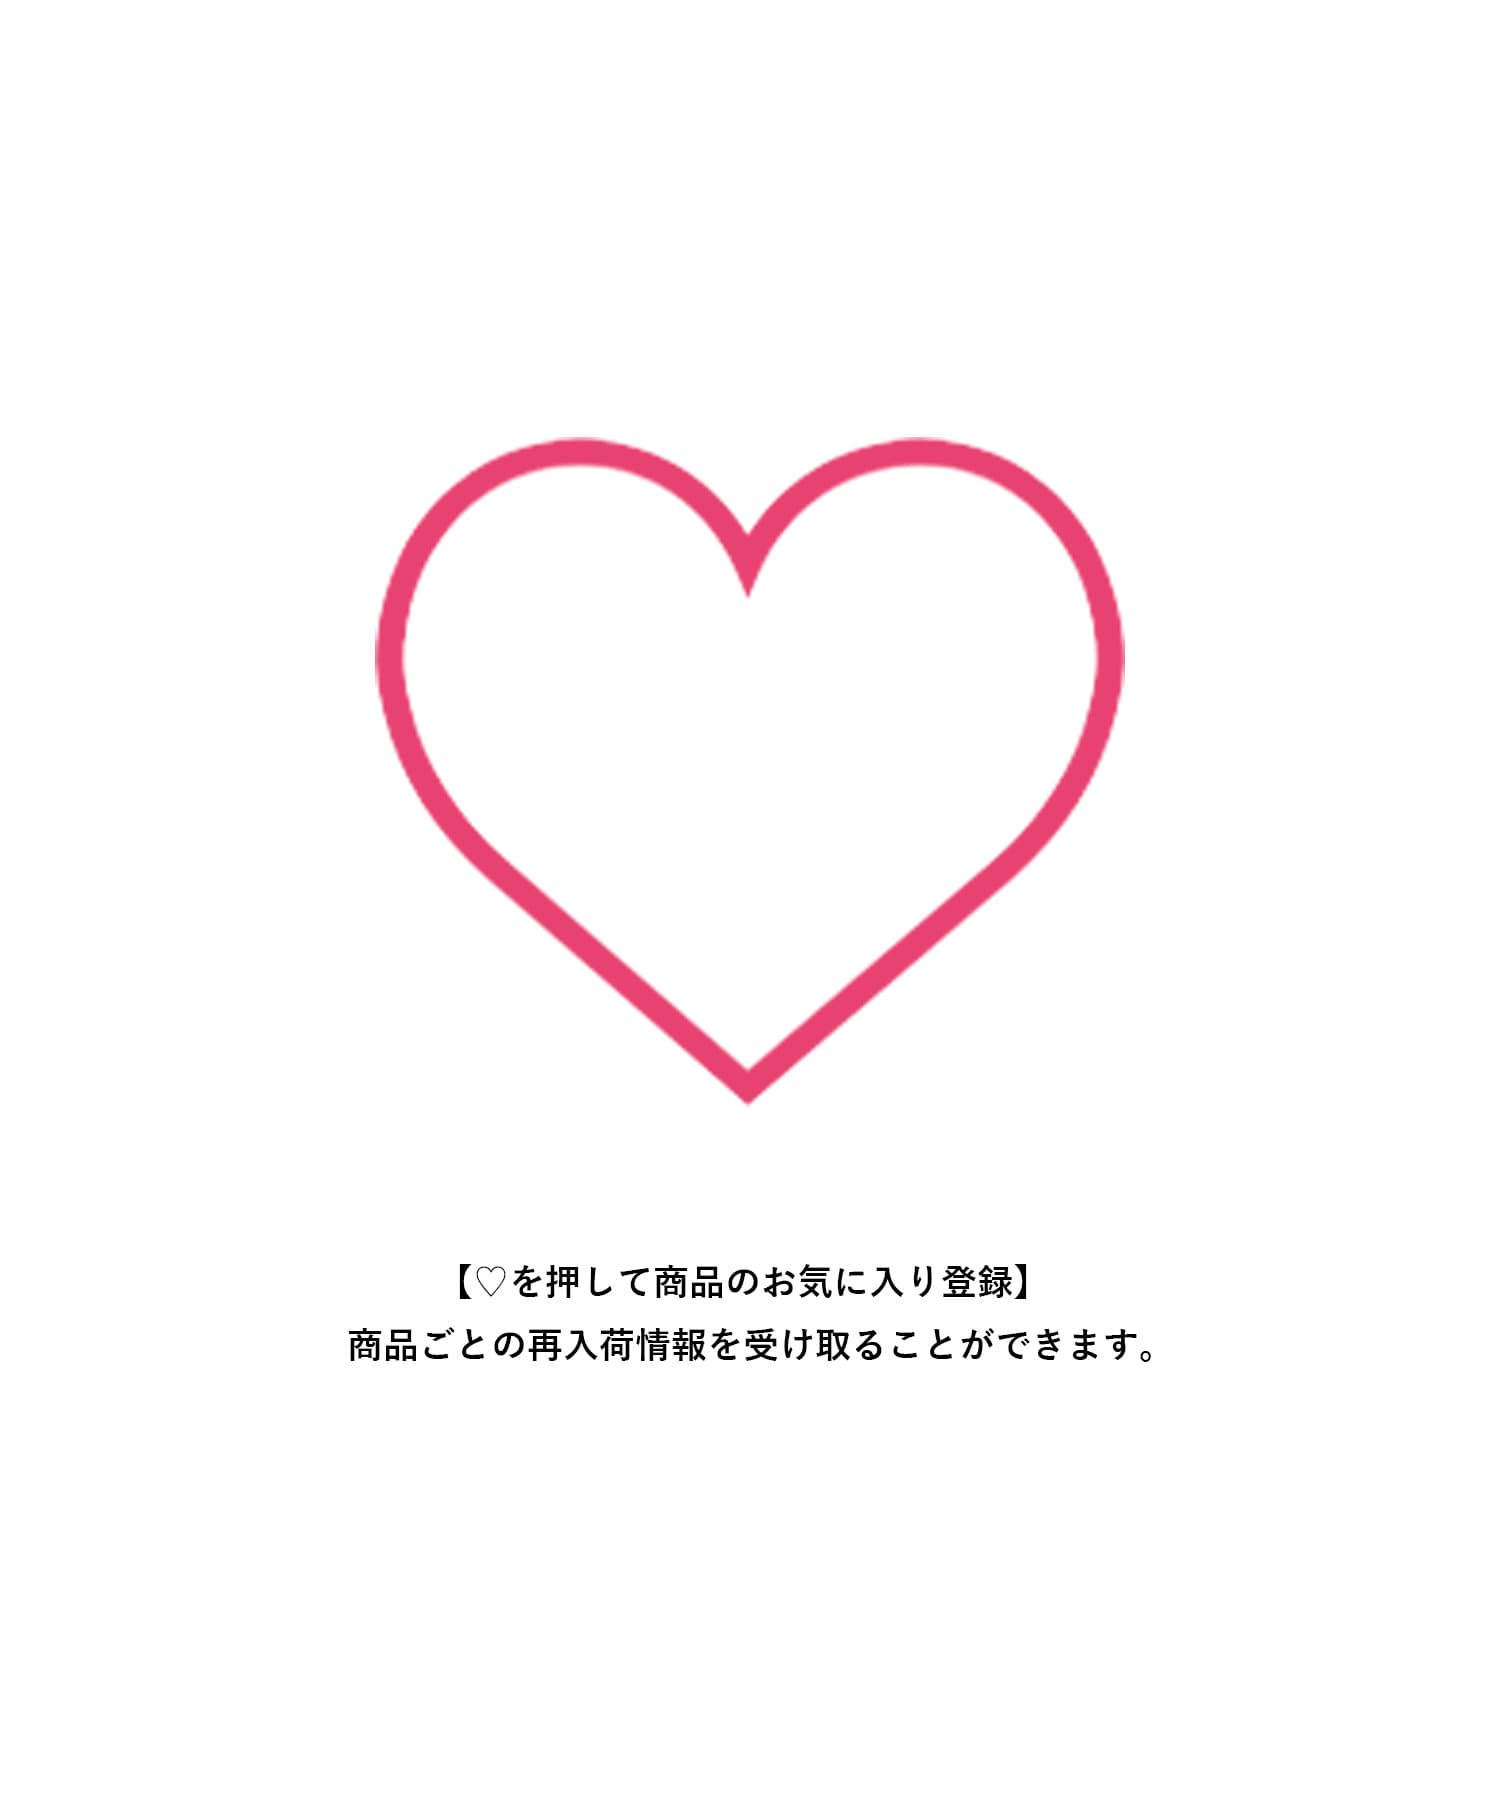 COLLAGE GALLARDAGALANTE(コラージュ ガリャルダガランテ) 【オンラインストア限定】エアリードレープ中綿コート